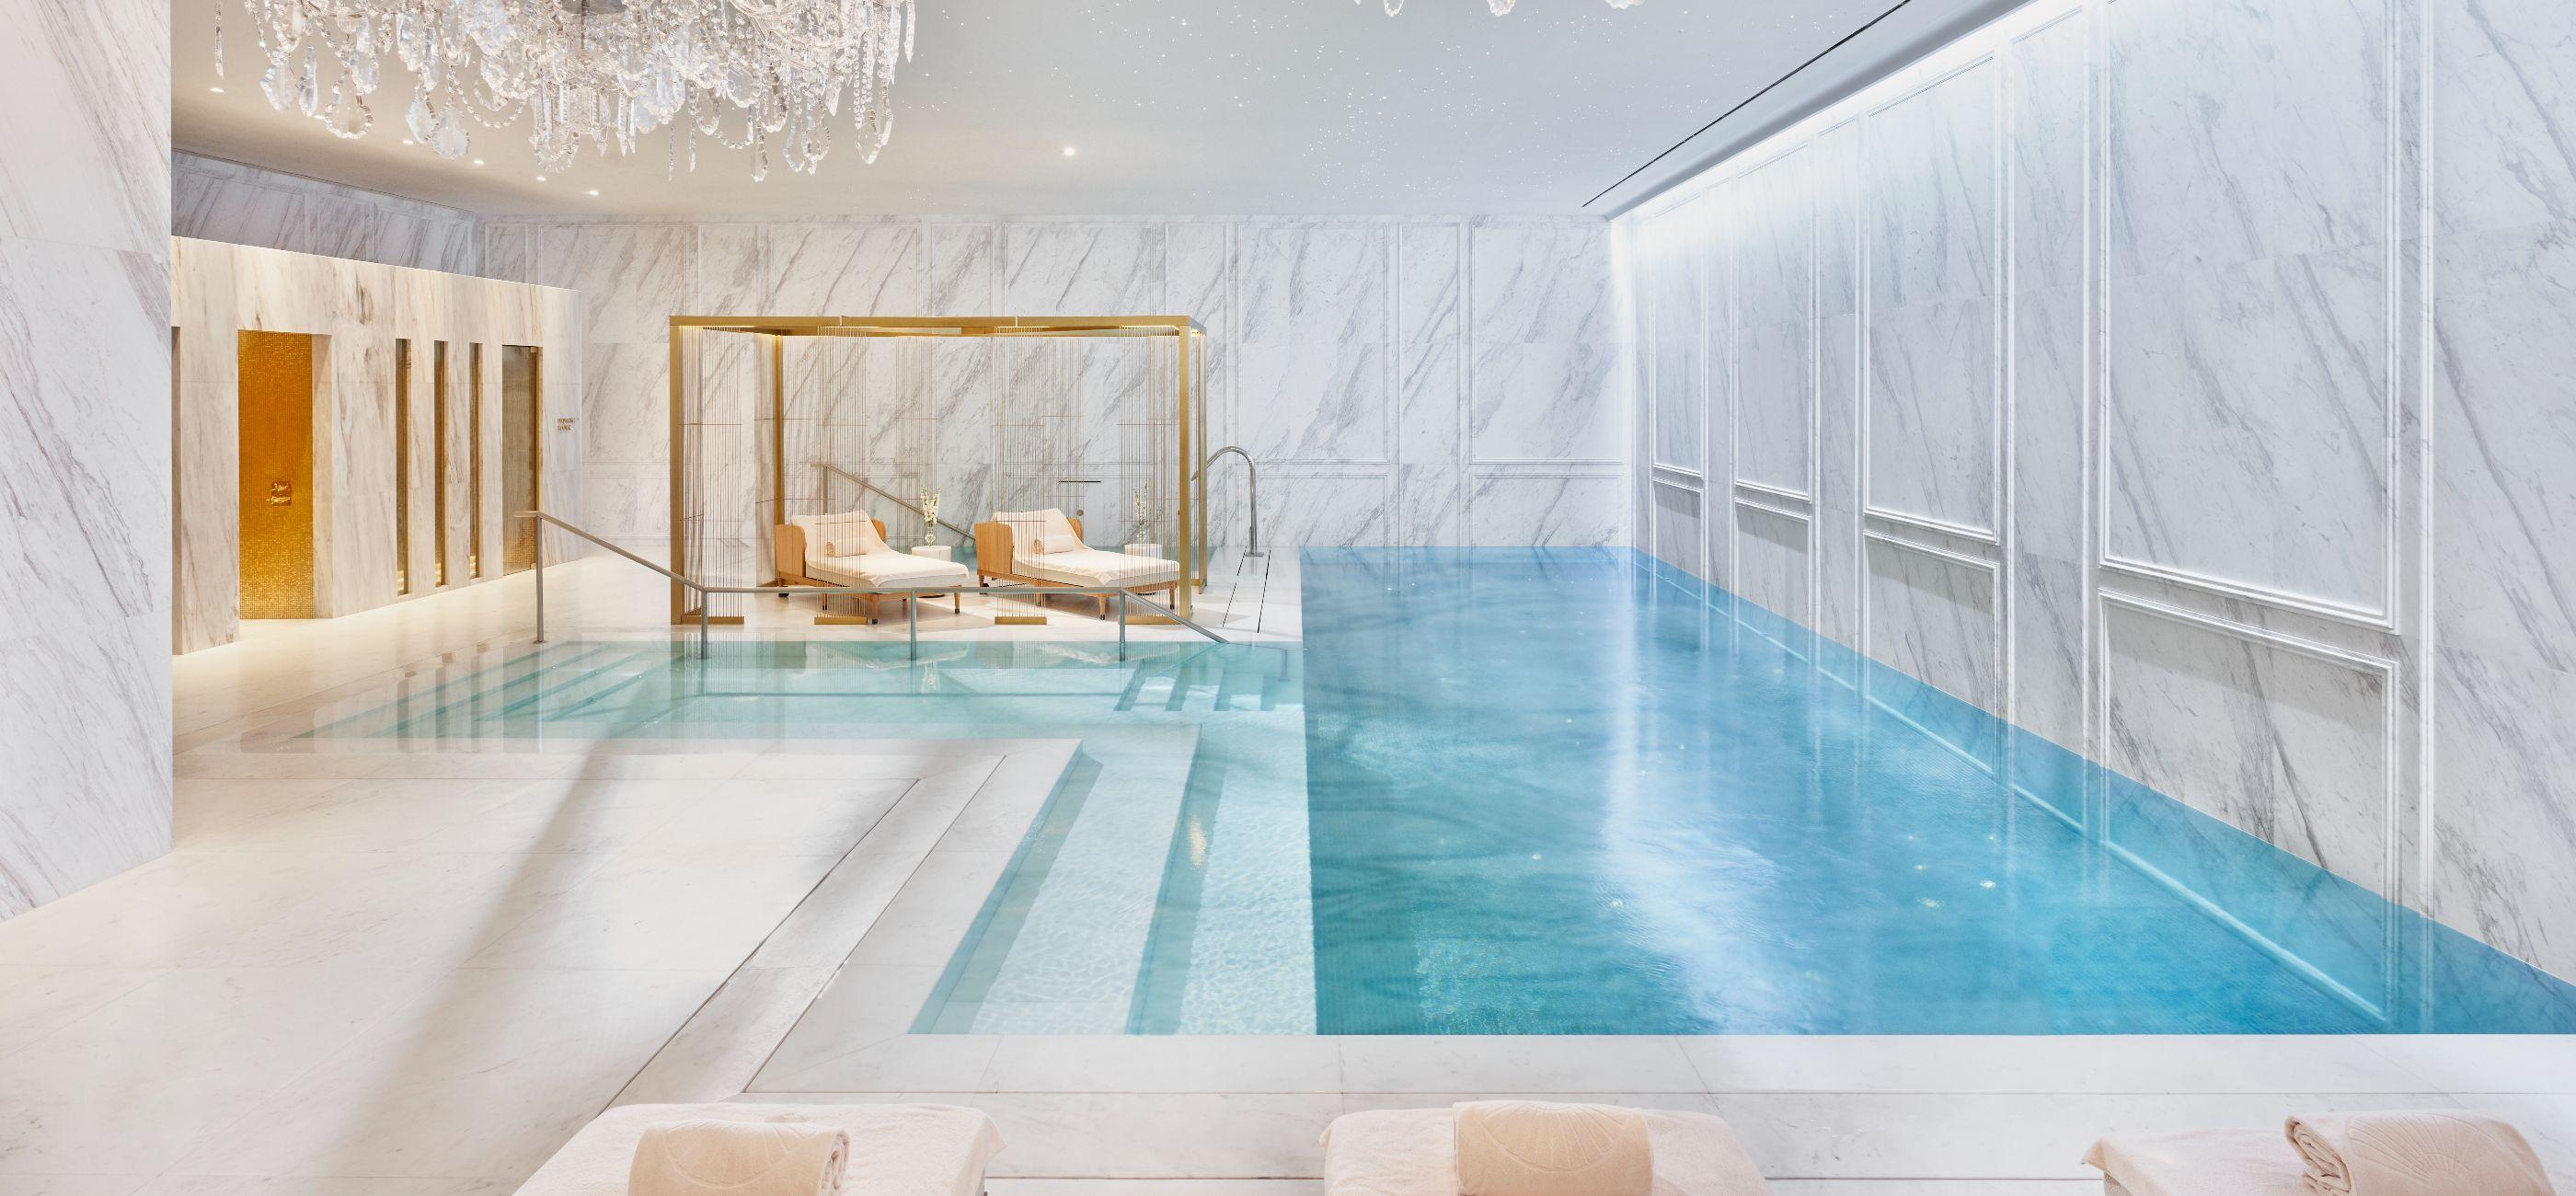 The Beauty Concept at Mandarin Oriental Ritz